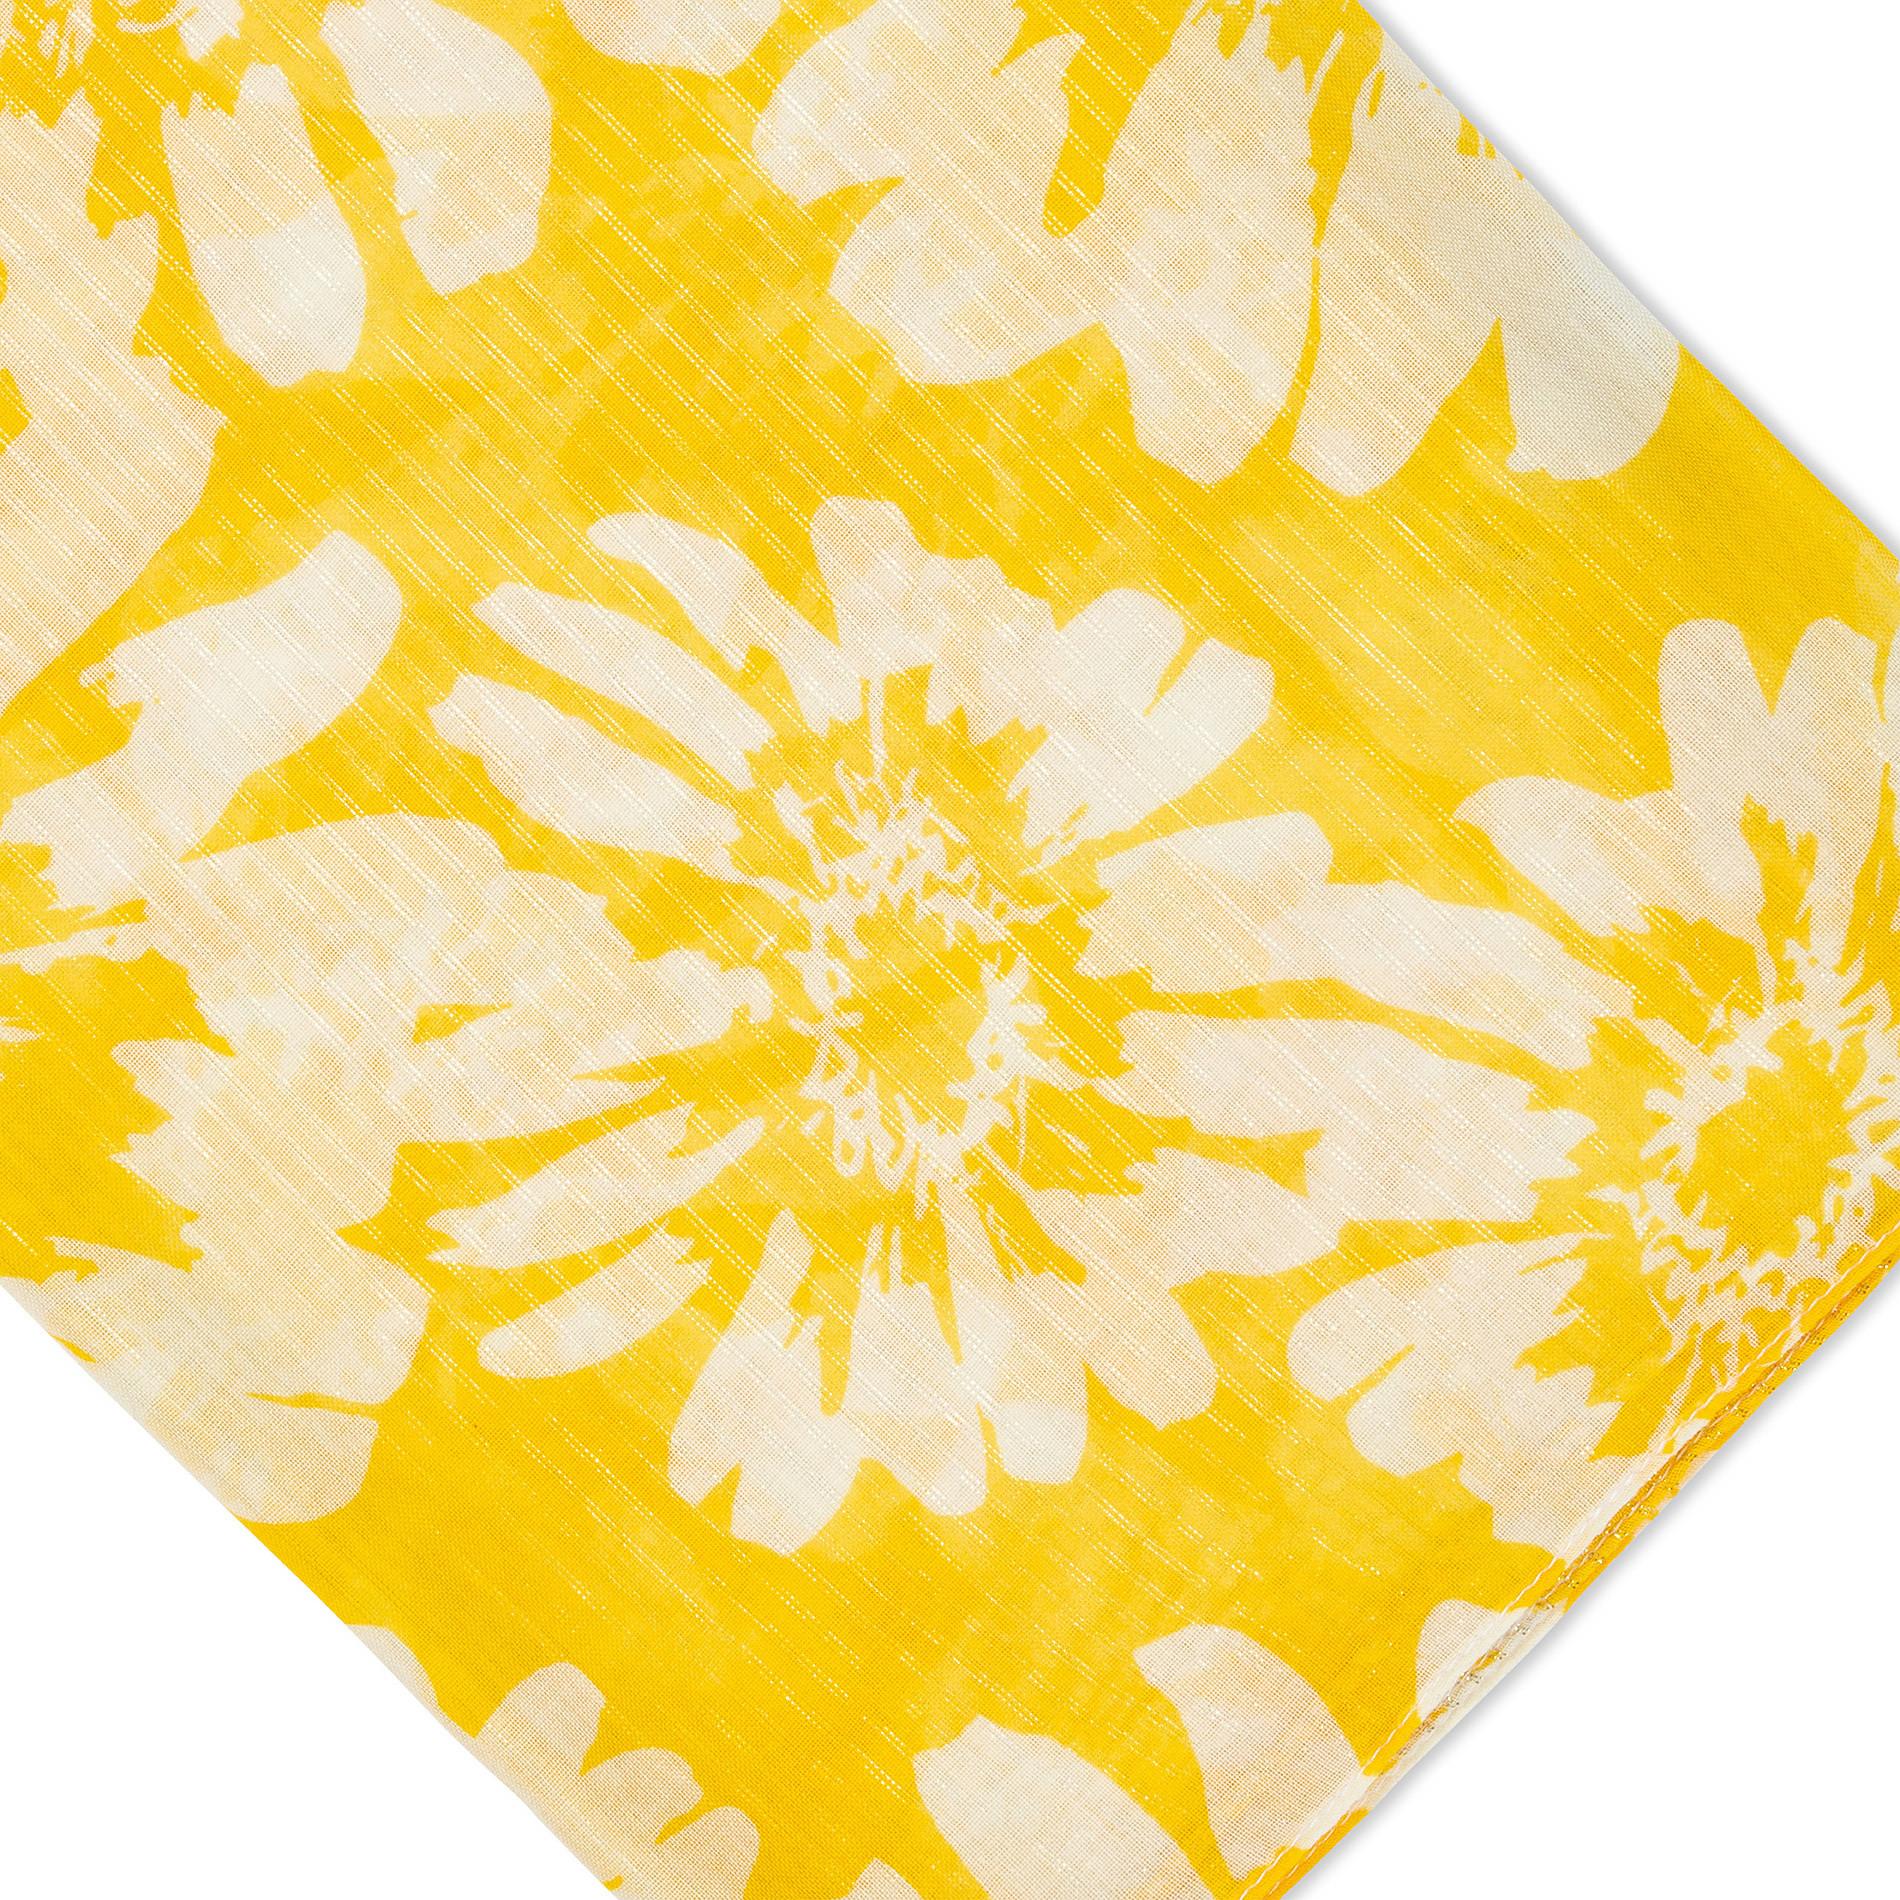 Sciarpa stampa fiori e lurex Koan, Giallo, large image number 1